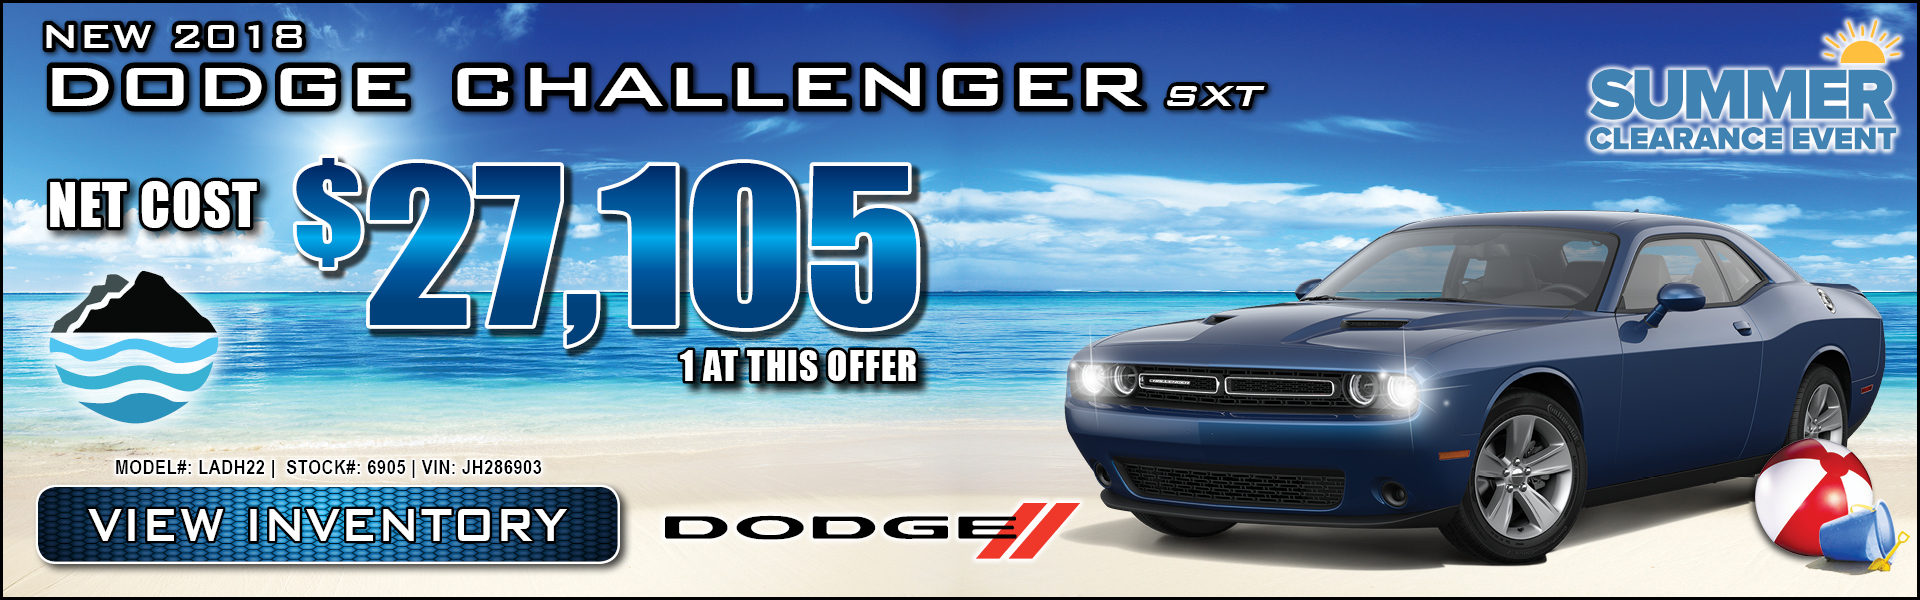 Dodge Challenger $27,105